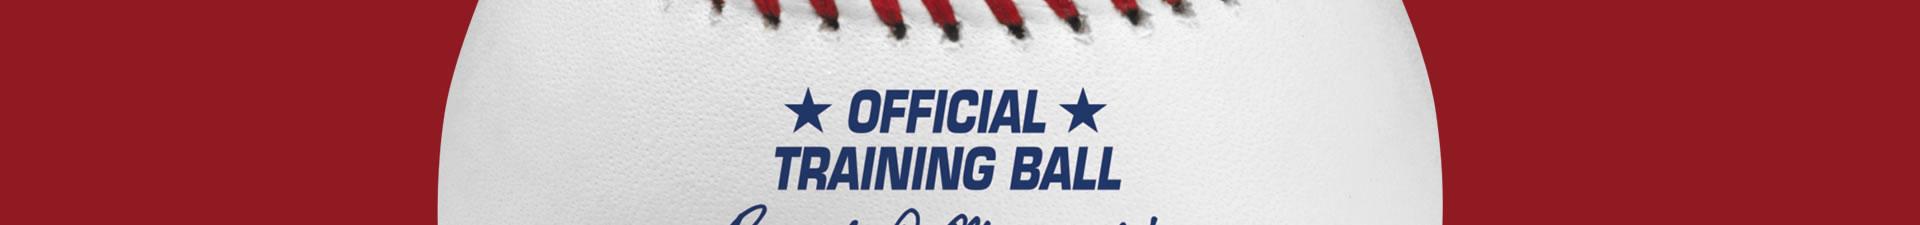 Rawlings Baseball Training